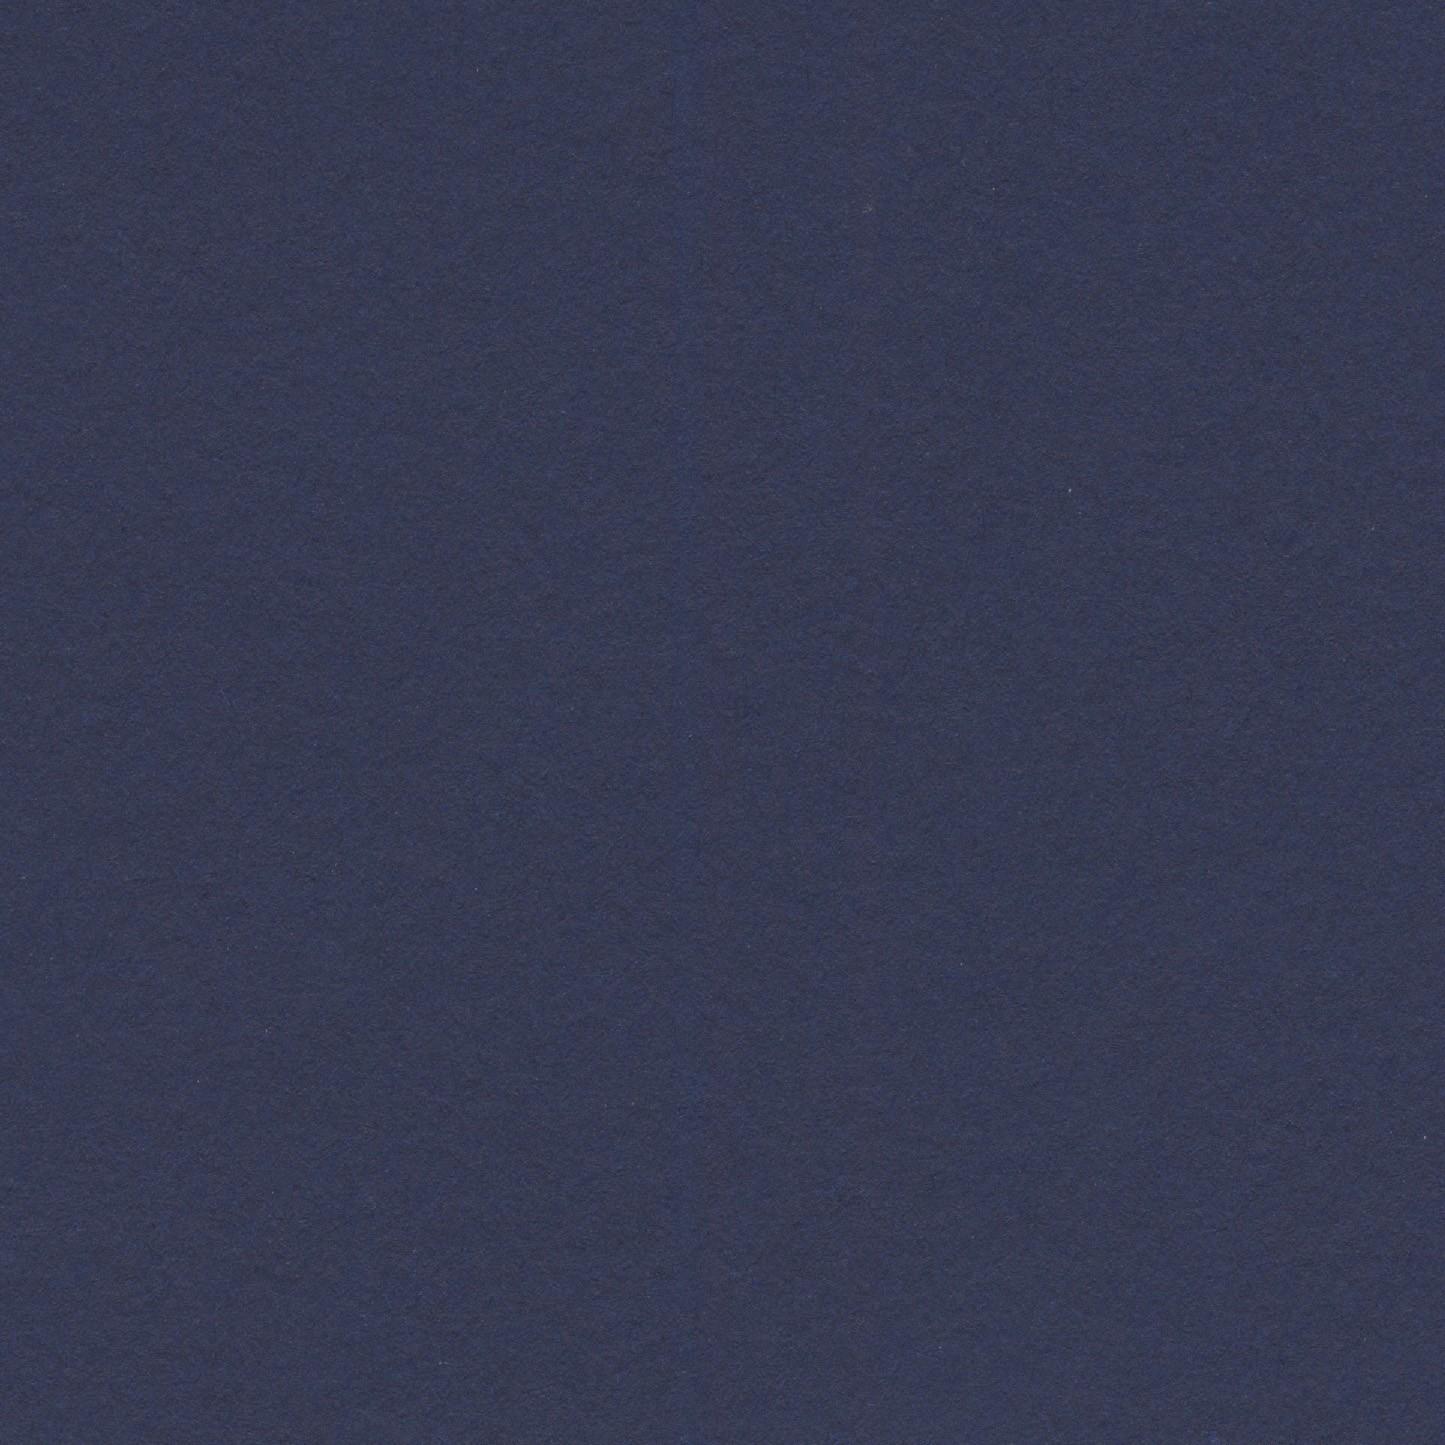 Blue - Navy 135gsm